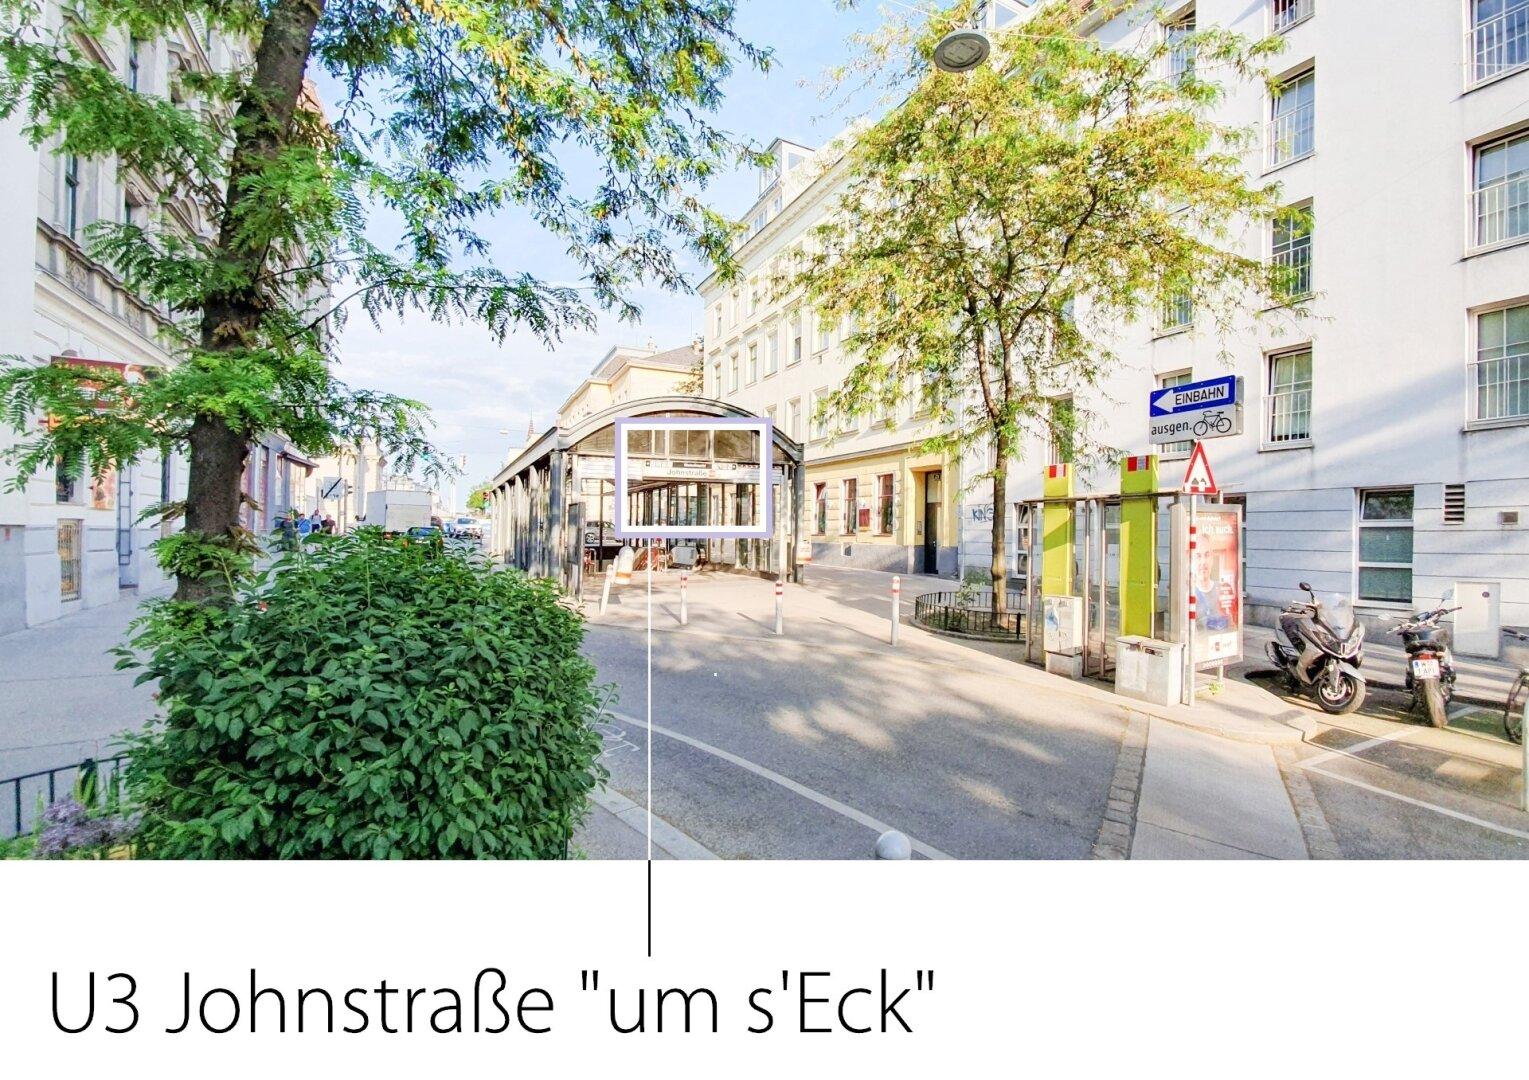 Nahe U3 Johnstraße